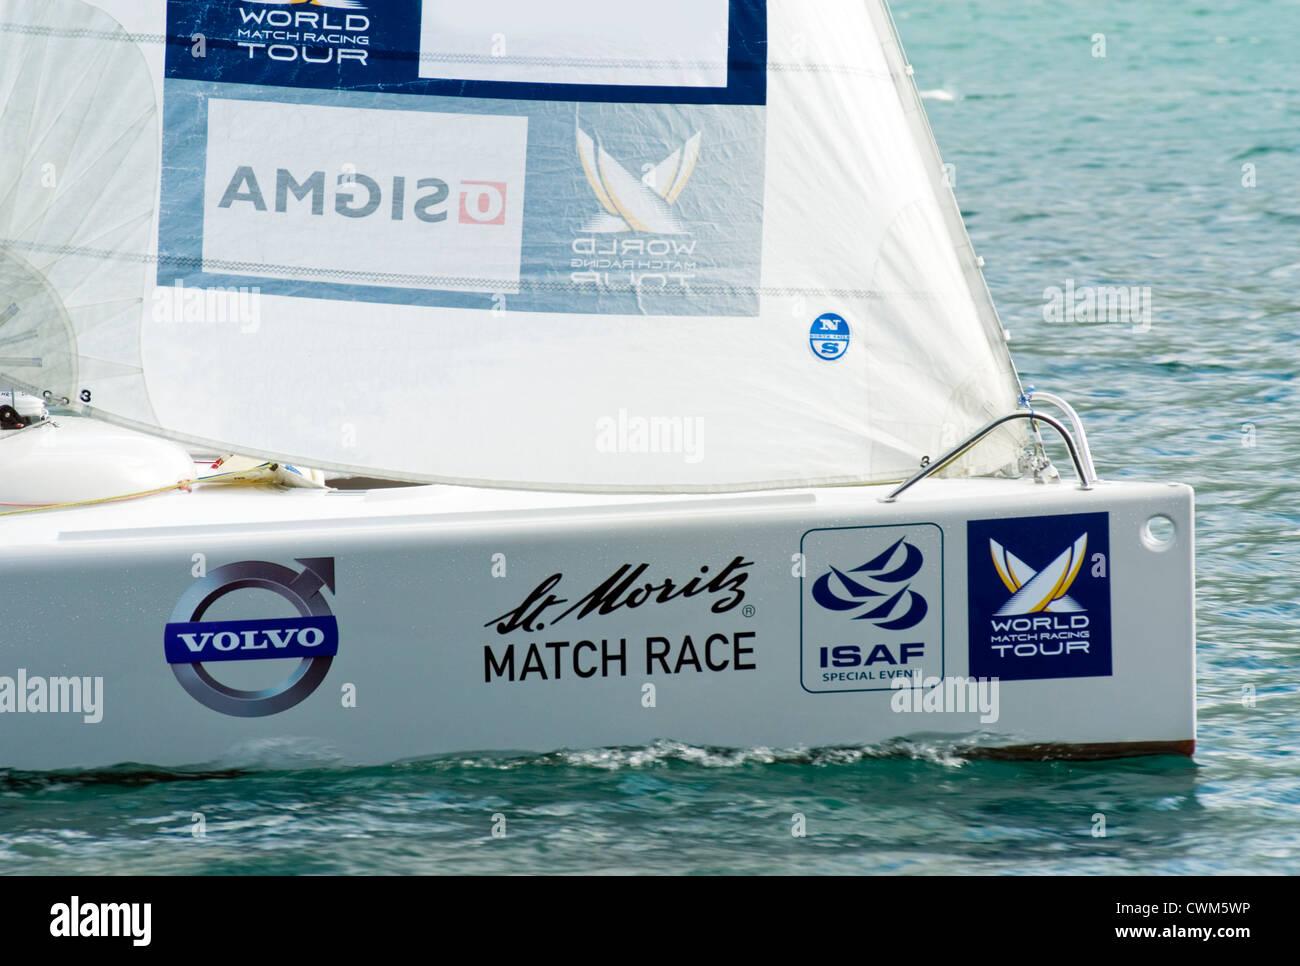 Sailing boats racing during the Match Race, St Moritz, Switzerland | Segelboote während des Match Races, St.Moritz, - Stock Image